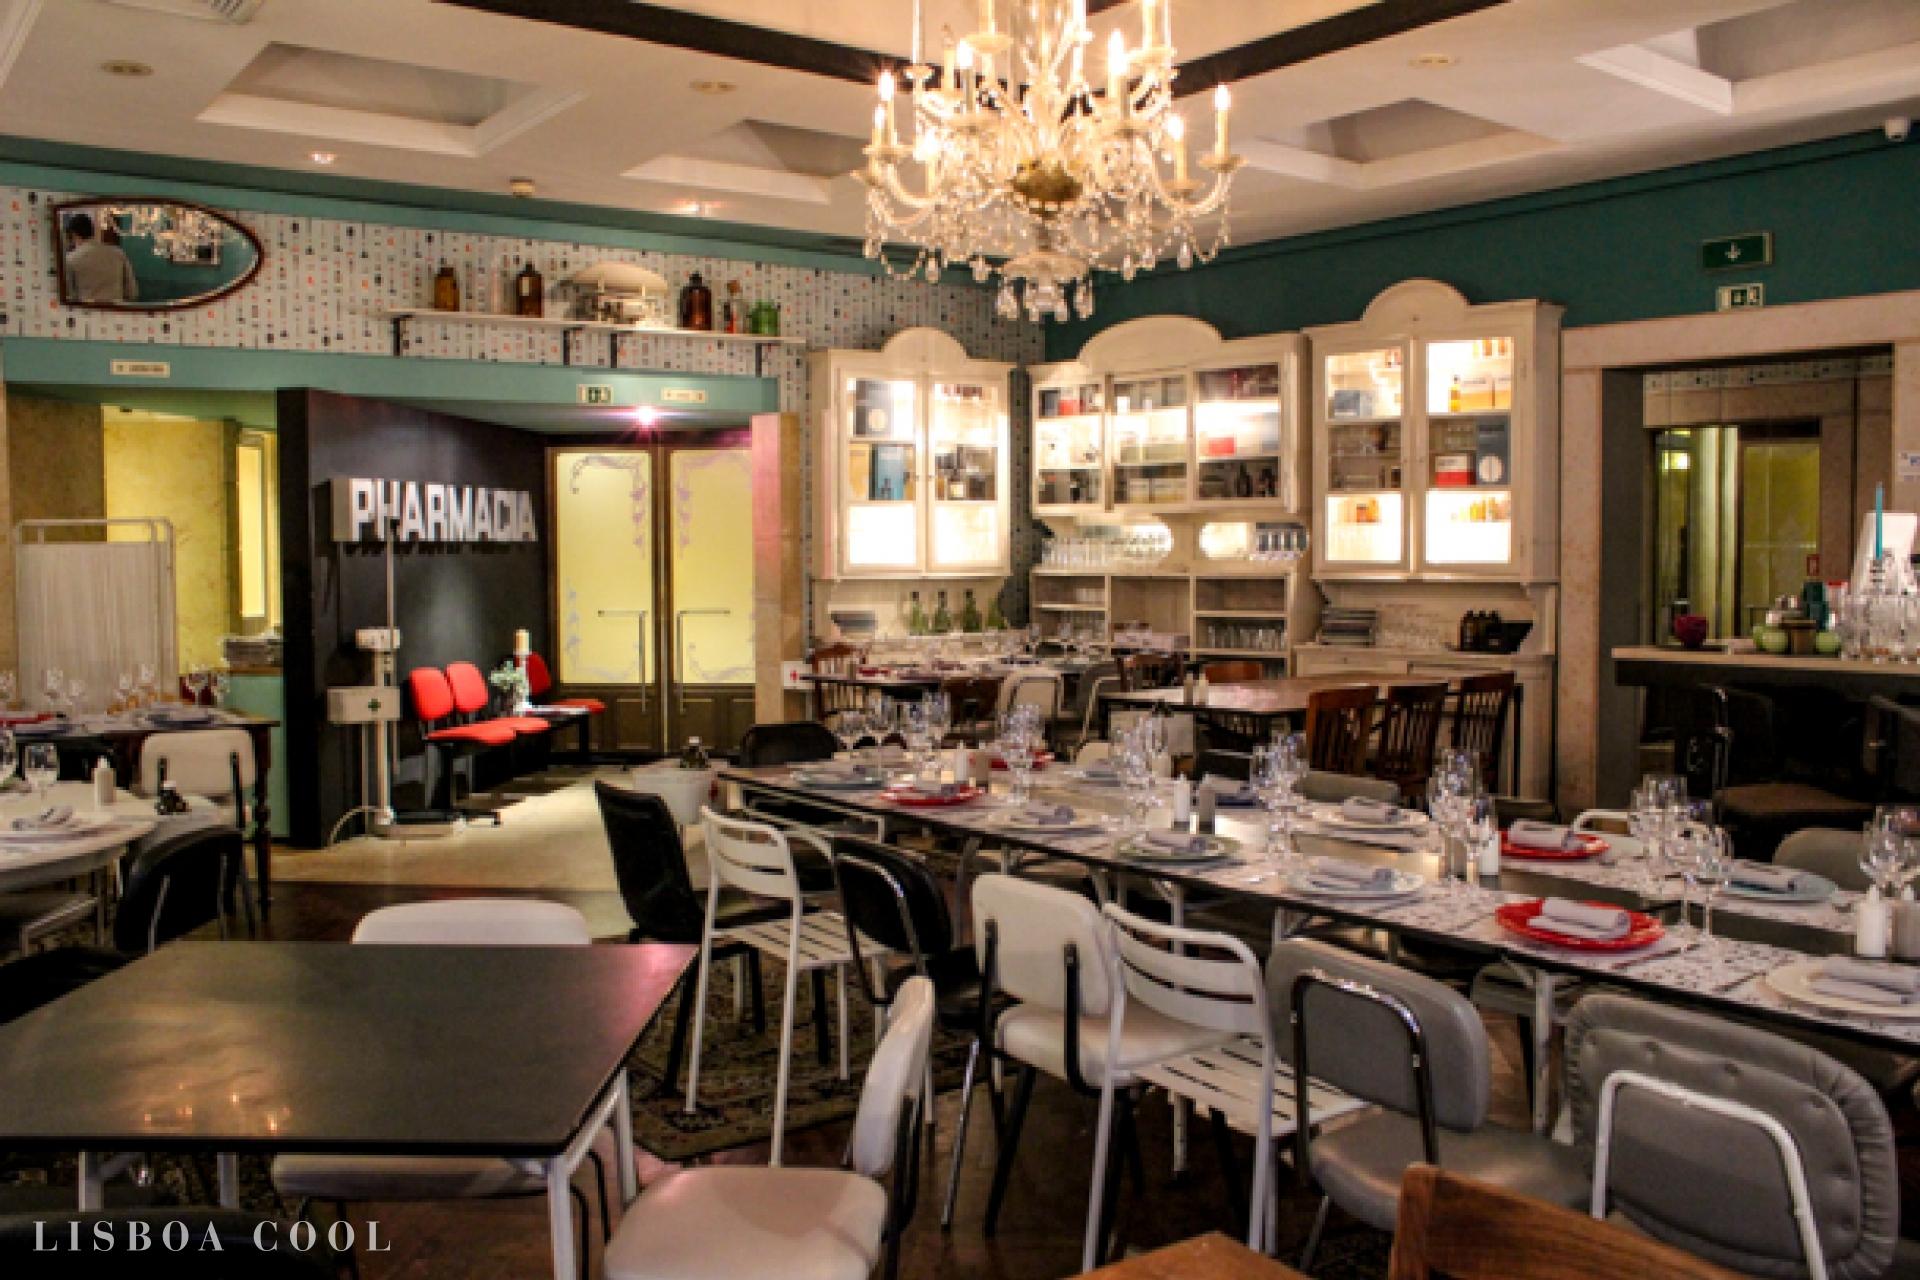 Restaurante pharm cia lisboa cool for Restaurant la cuisine dax